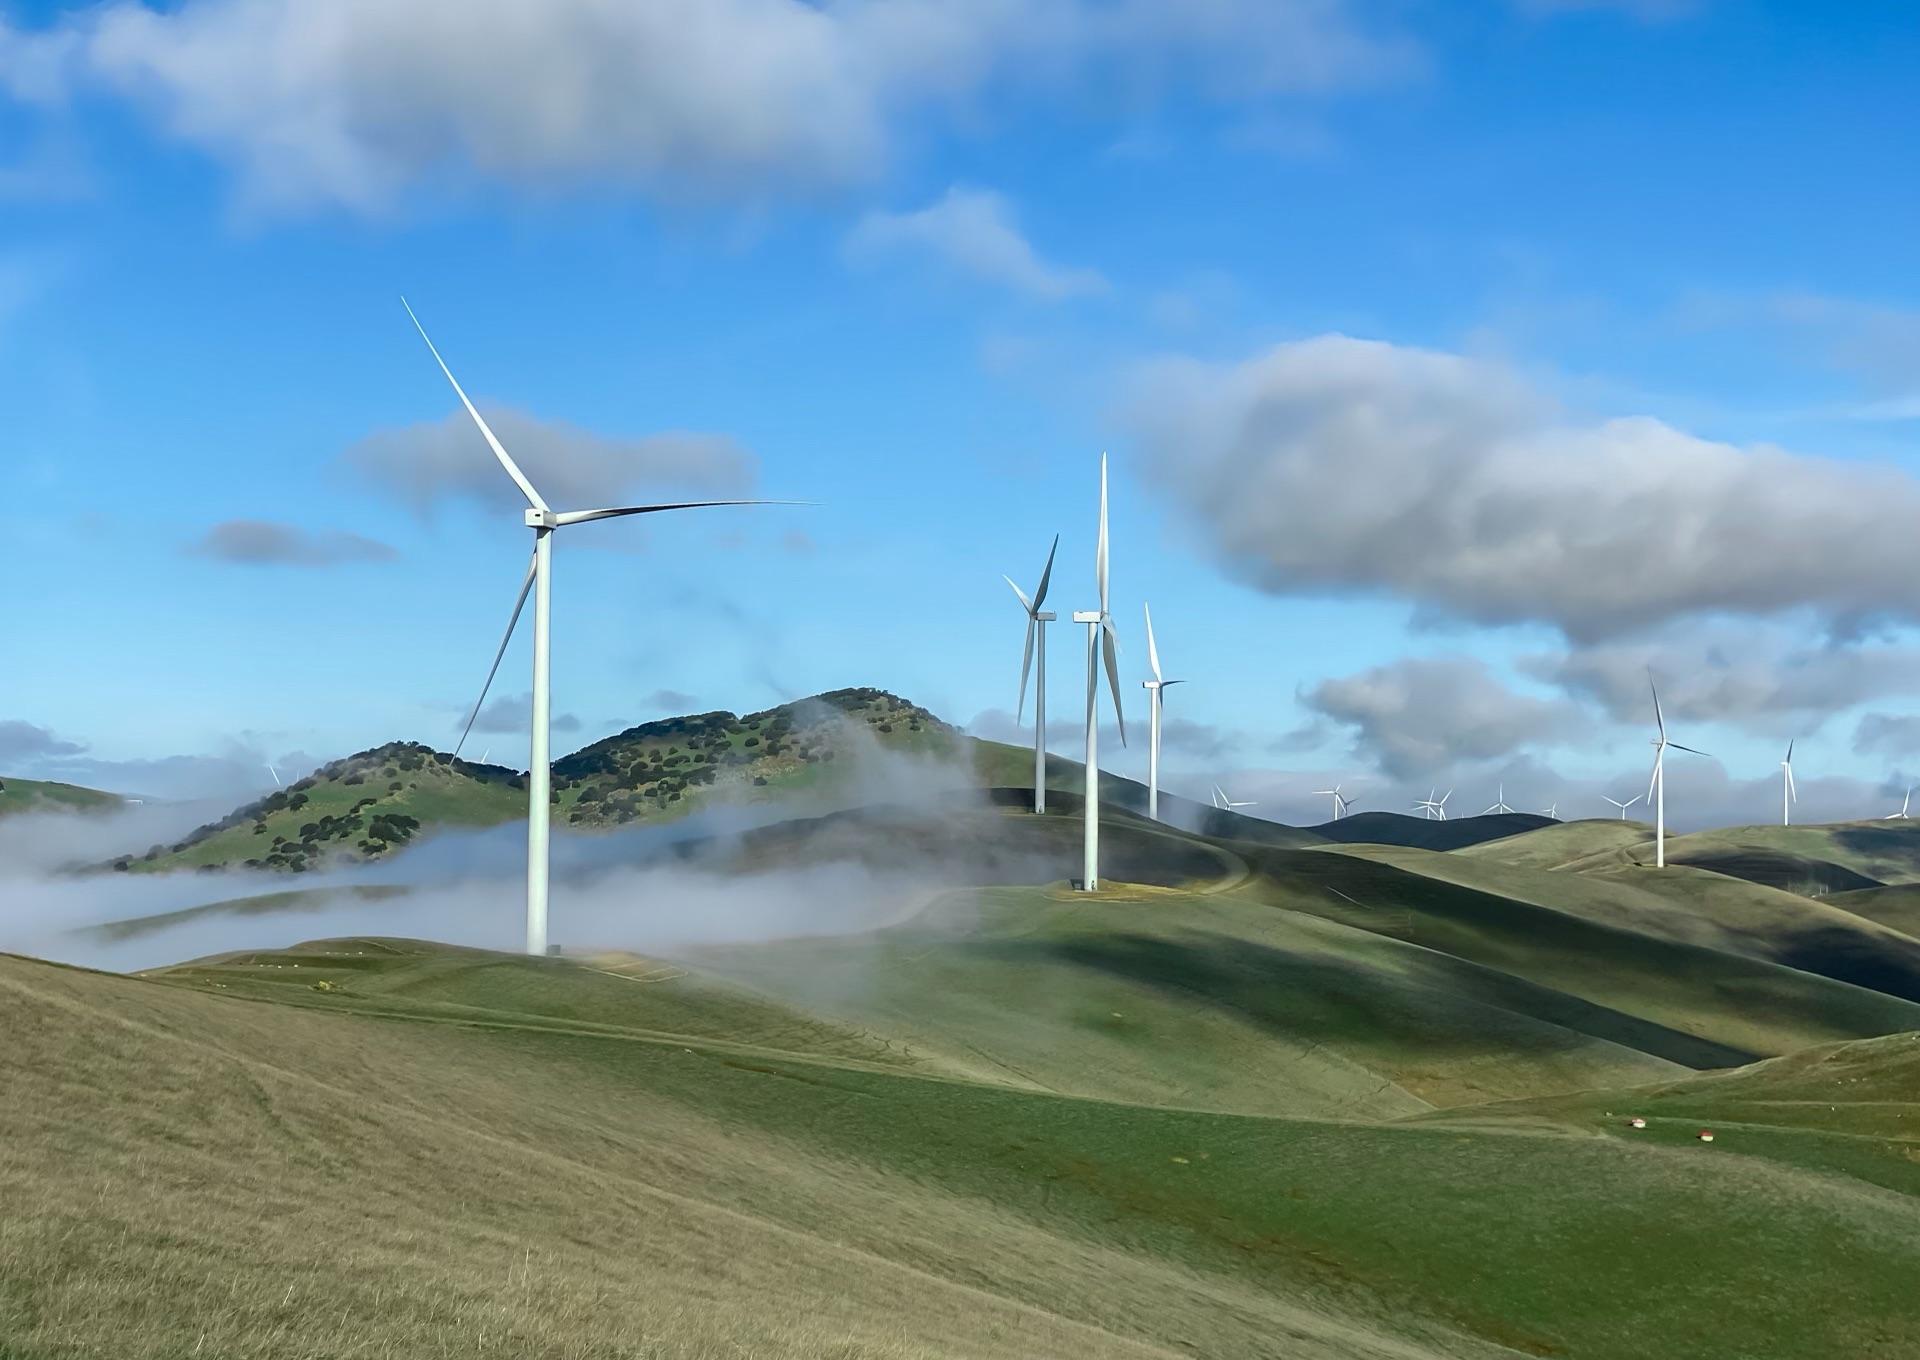 New Altamont wind center